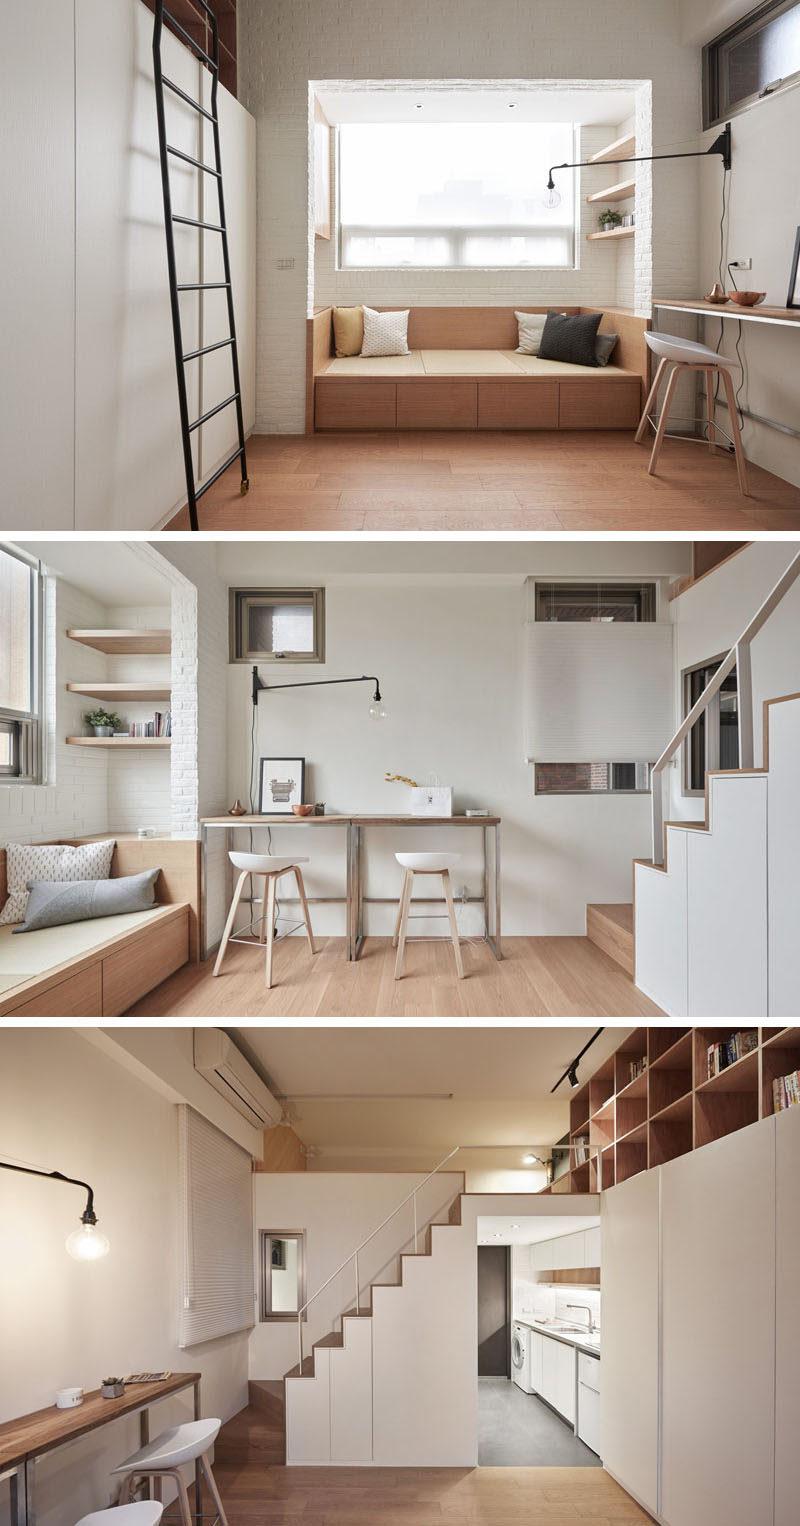 Additional Kitchen Storage Counter Space